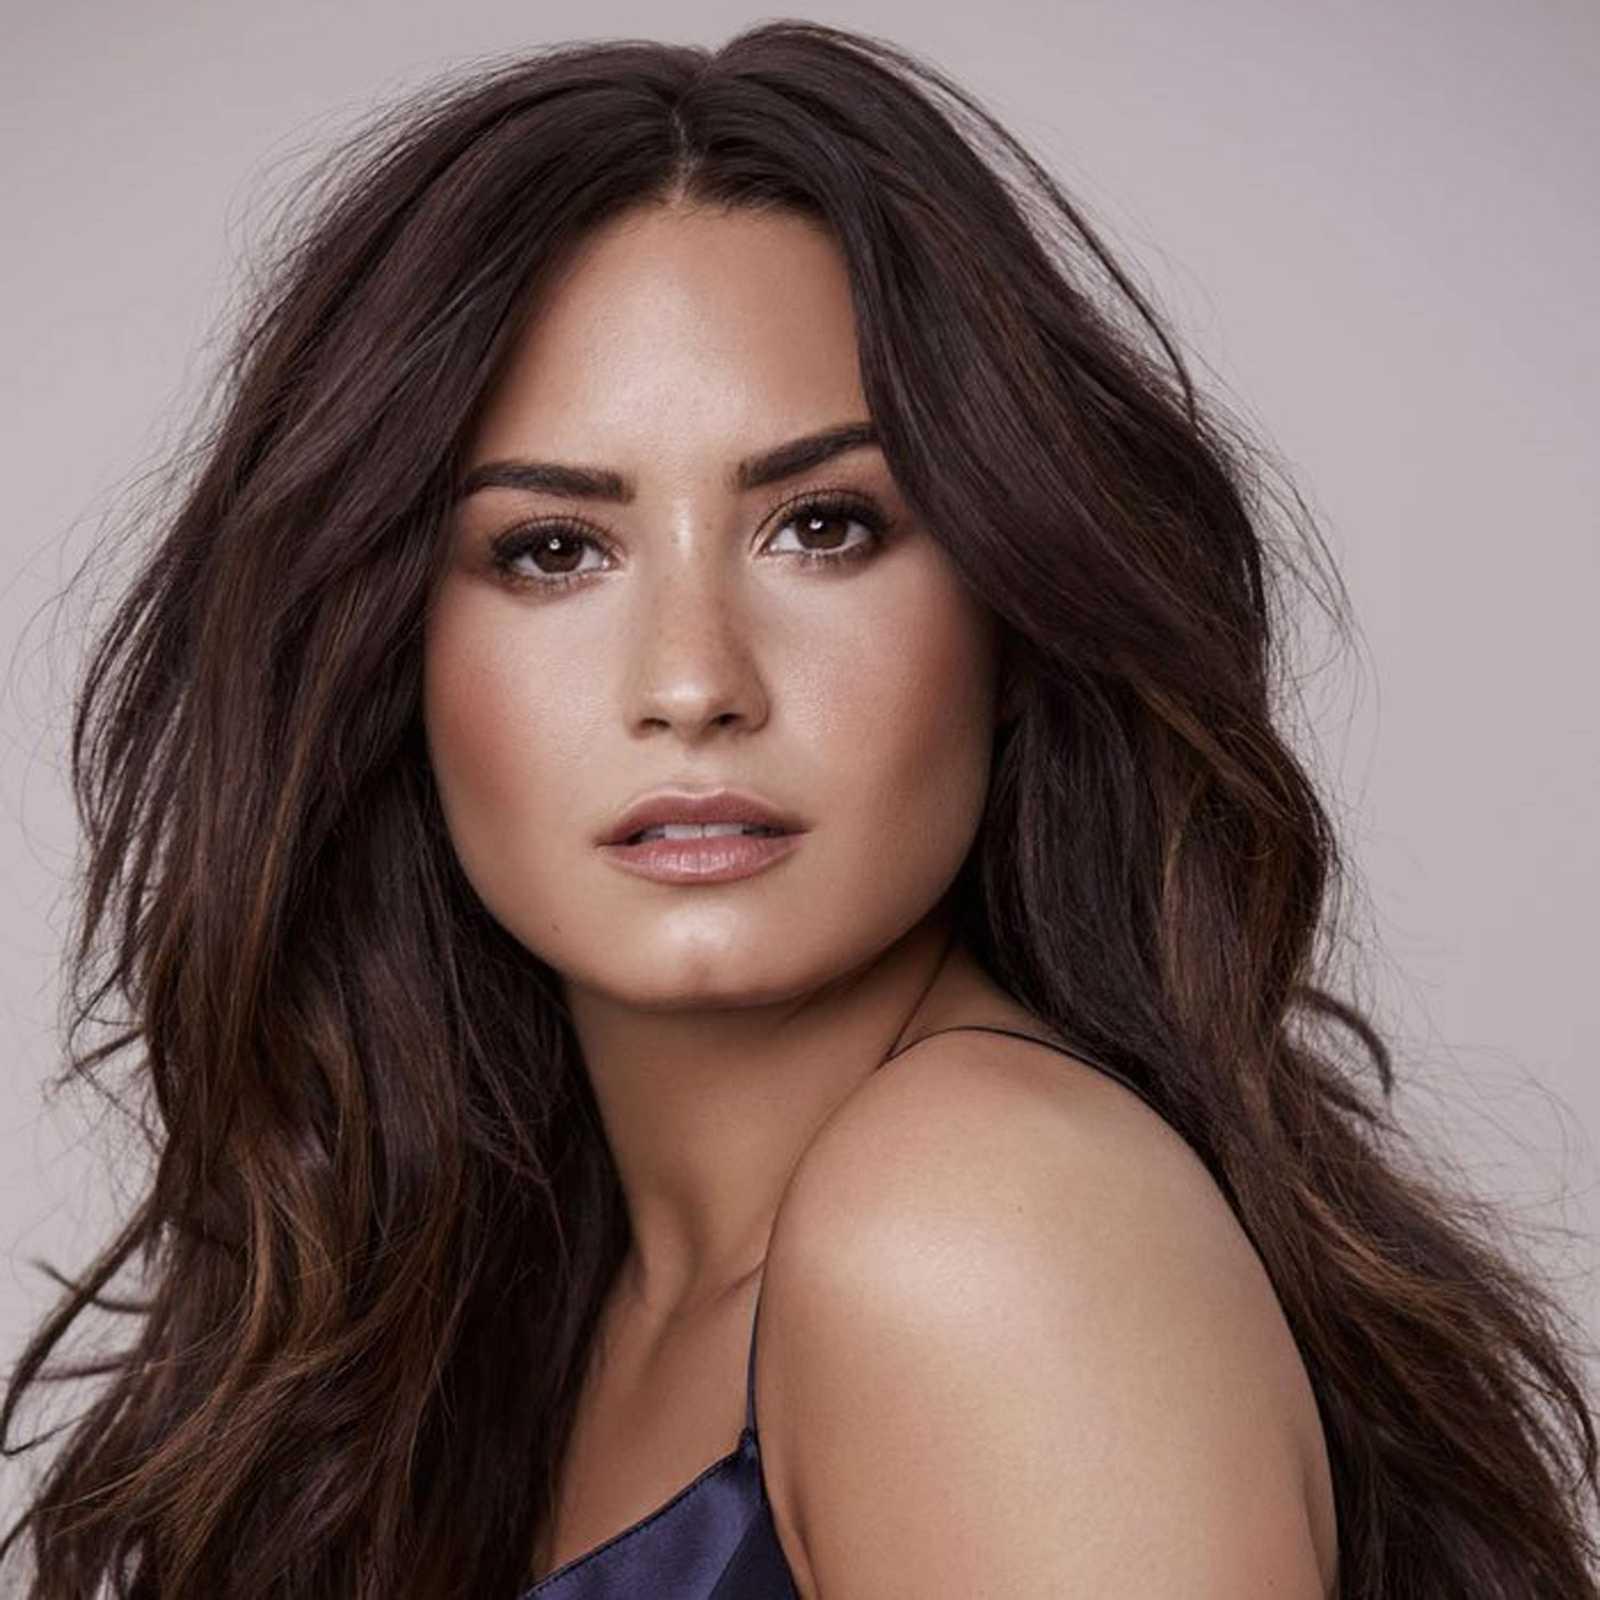 Demi_Lovato_-_Dennis_Leupold_Photoshoots_2017-01.jpg